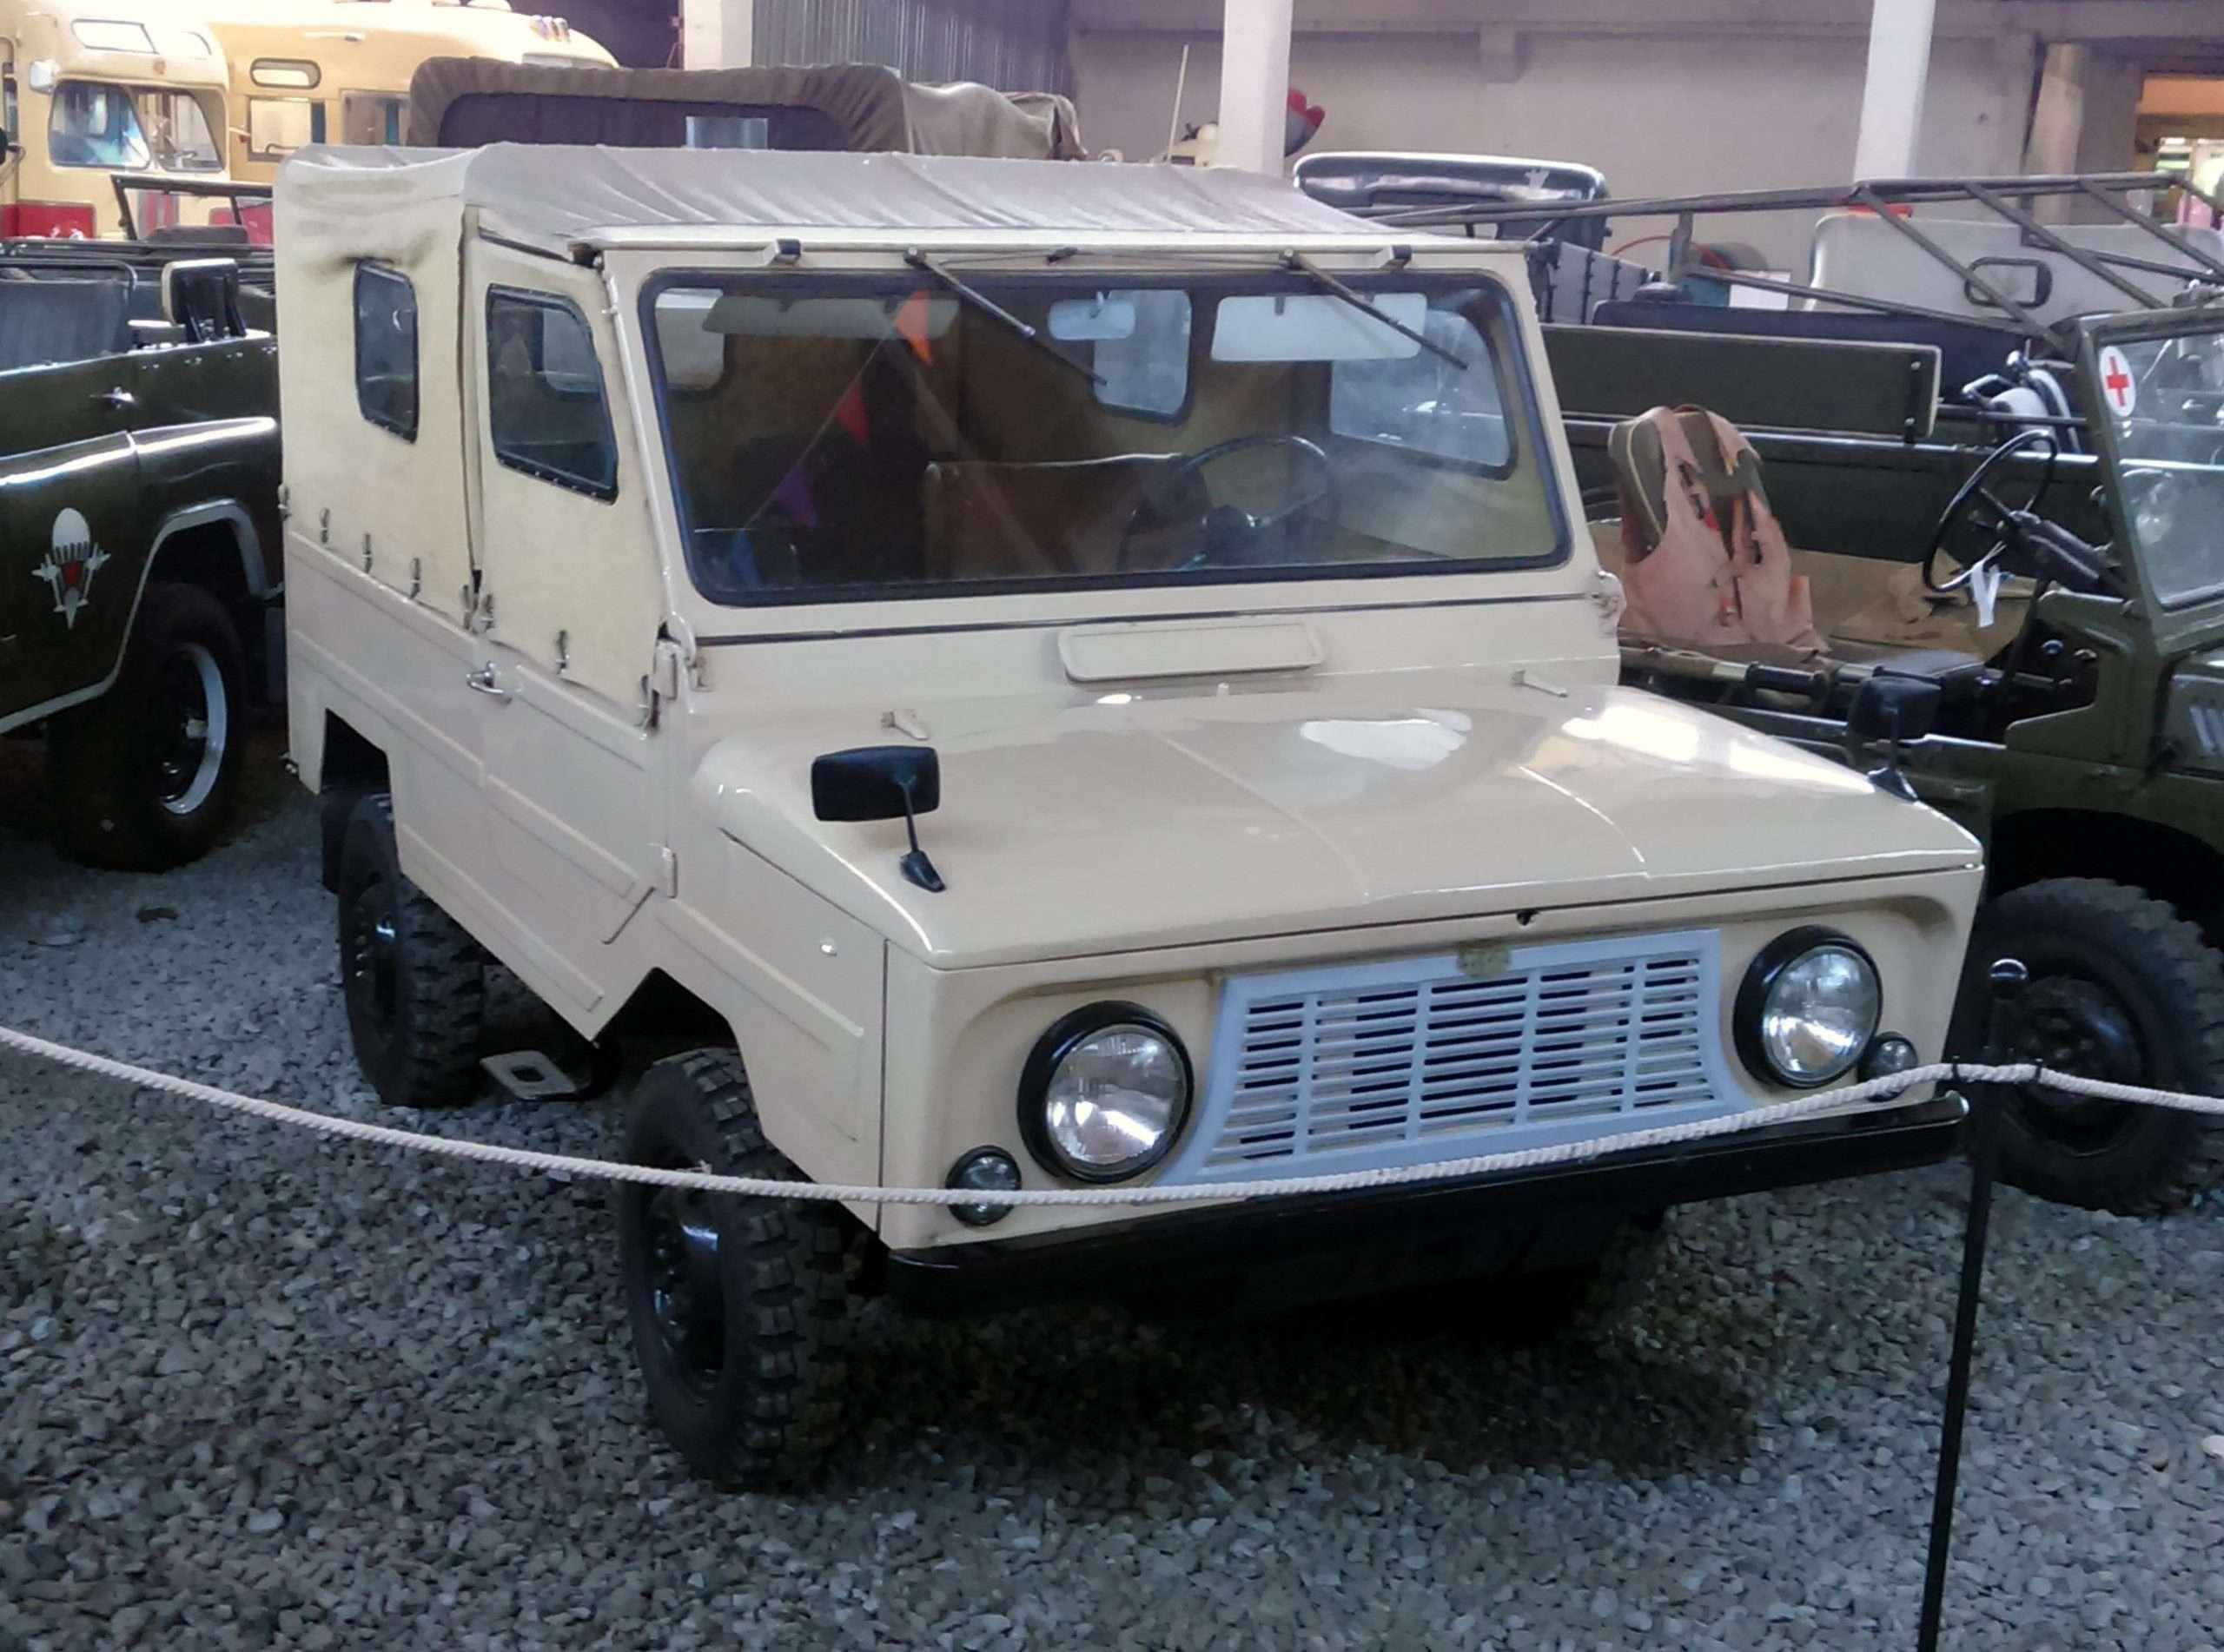 ЛуАЗ 969 технические характеристики эксплуатация и ремонт: машина волынка